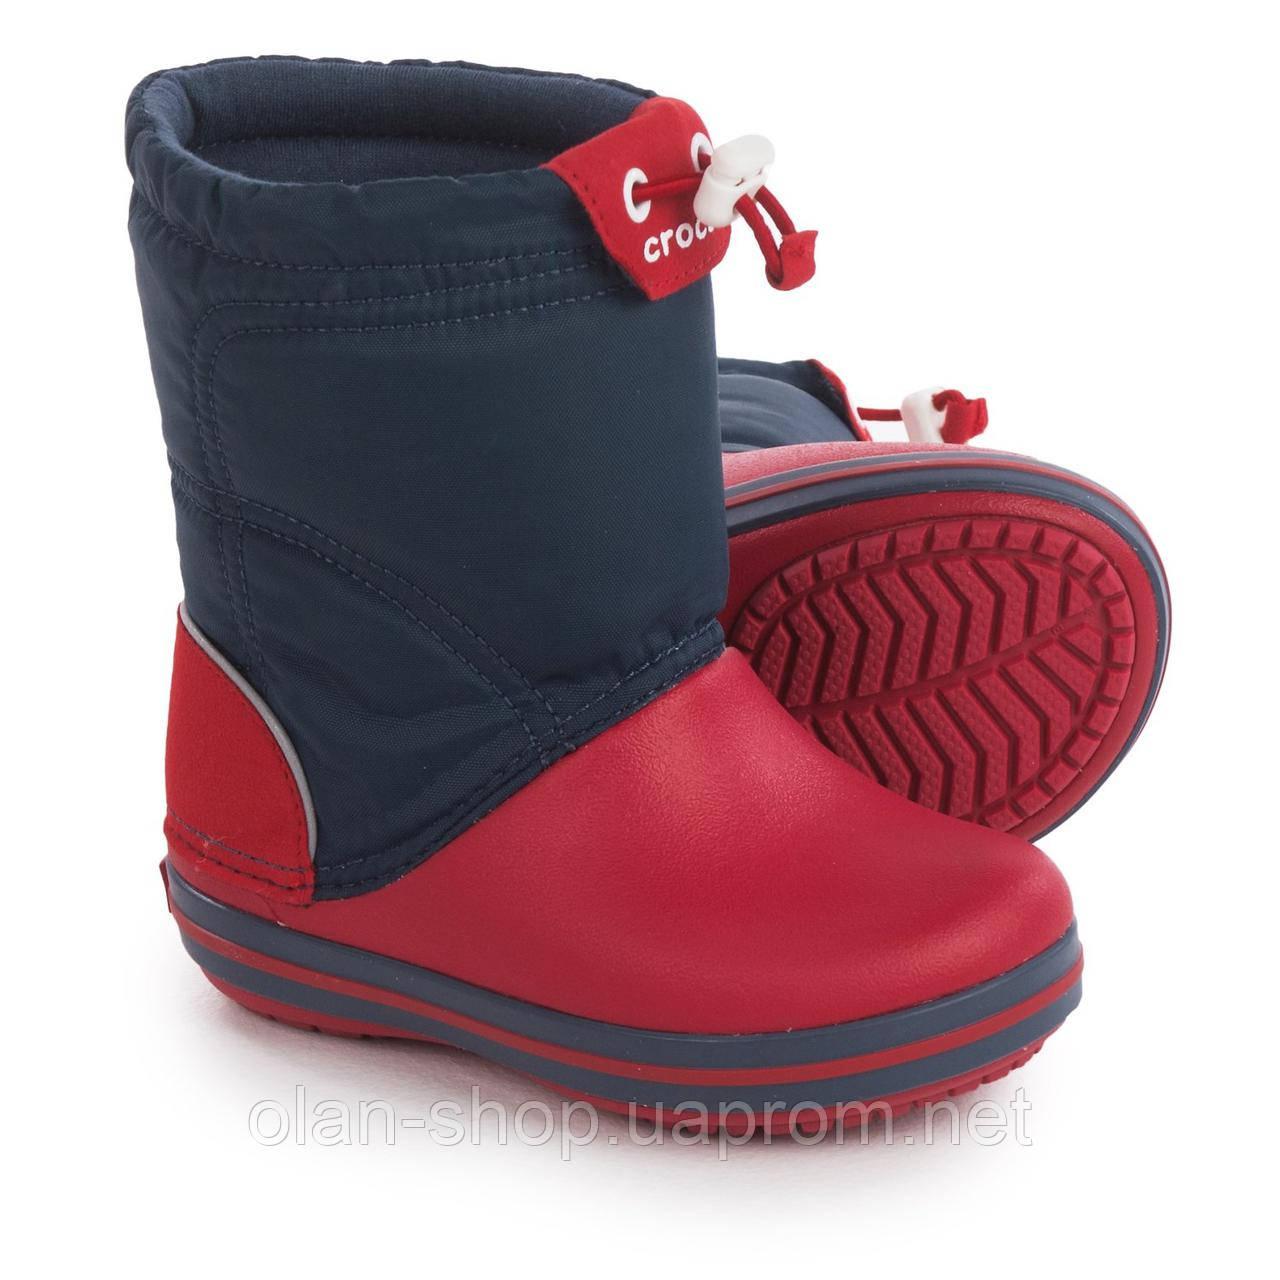 98081be87 Детские ботинки Crocs crocband lodgepoint snow boots, цена 900 грн ...